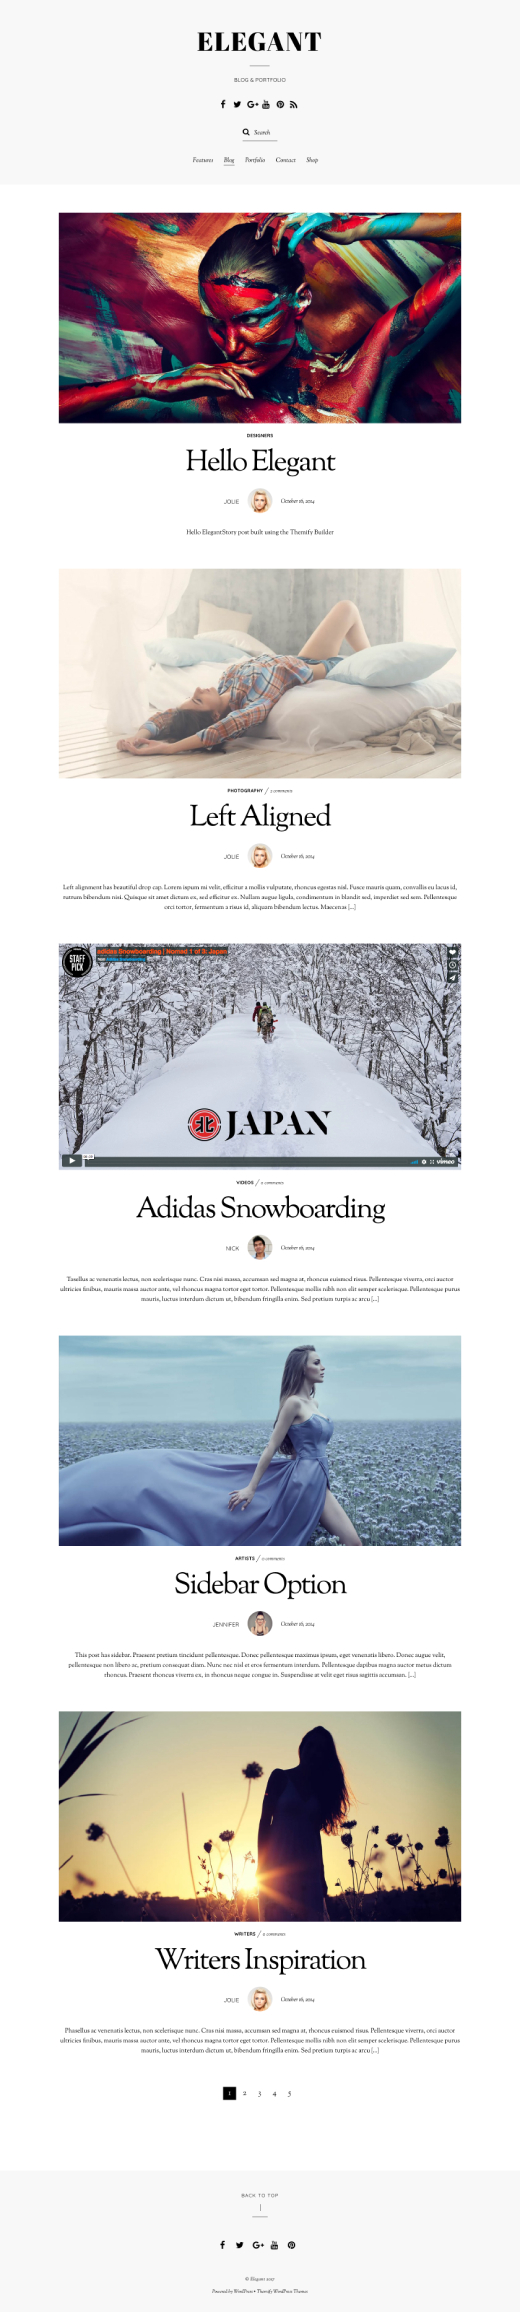 Elegant Theme - Minimal Blog & Portfolio